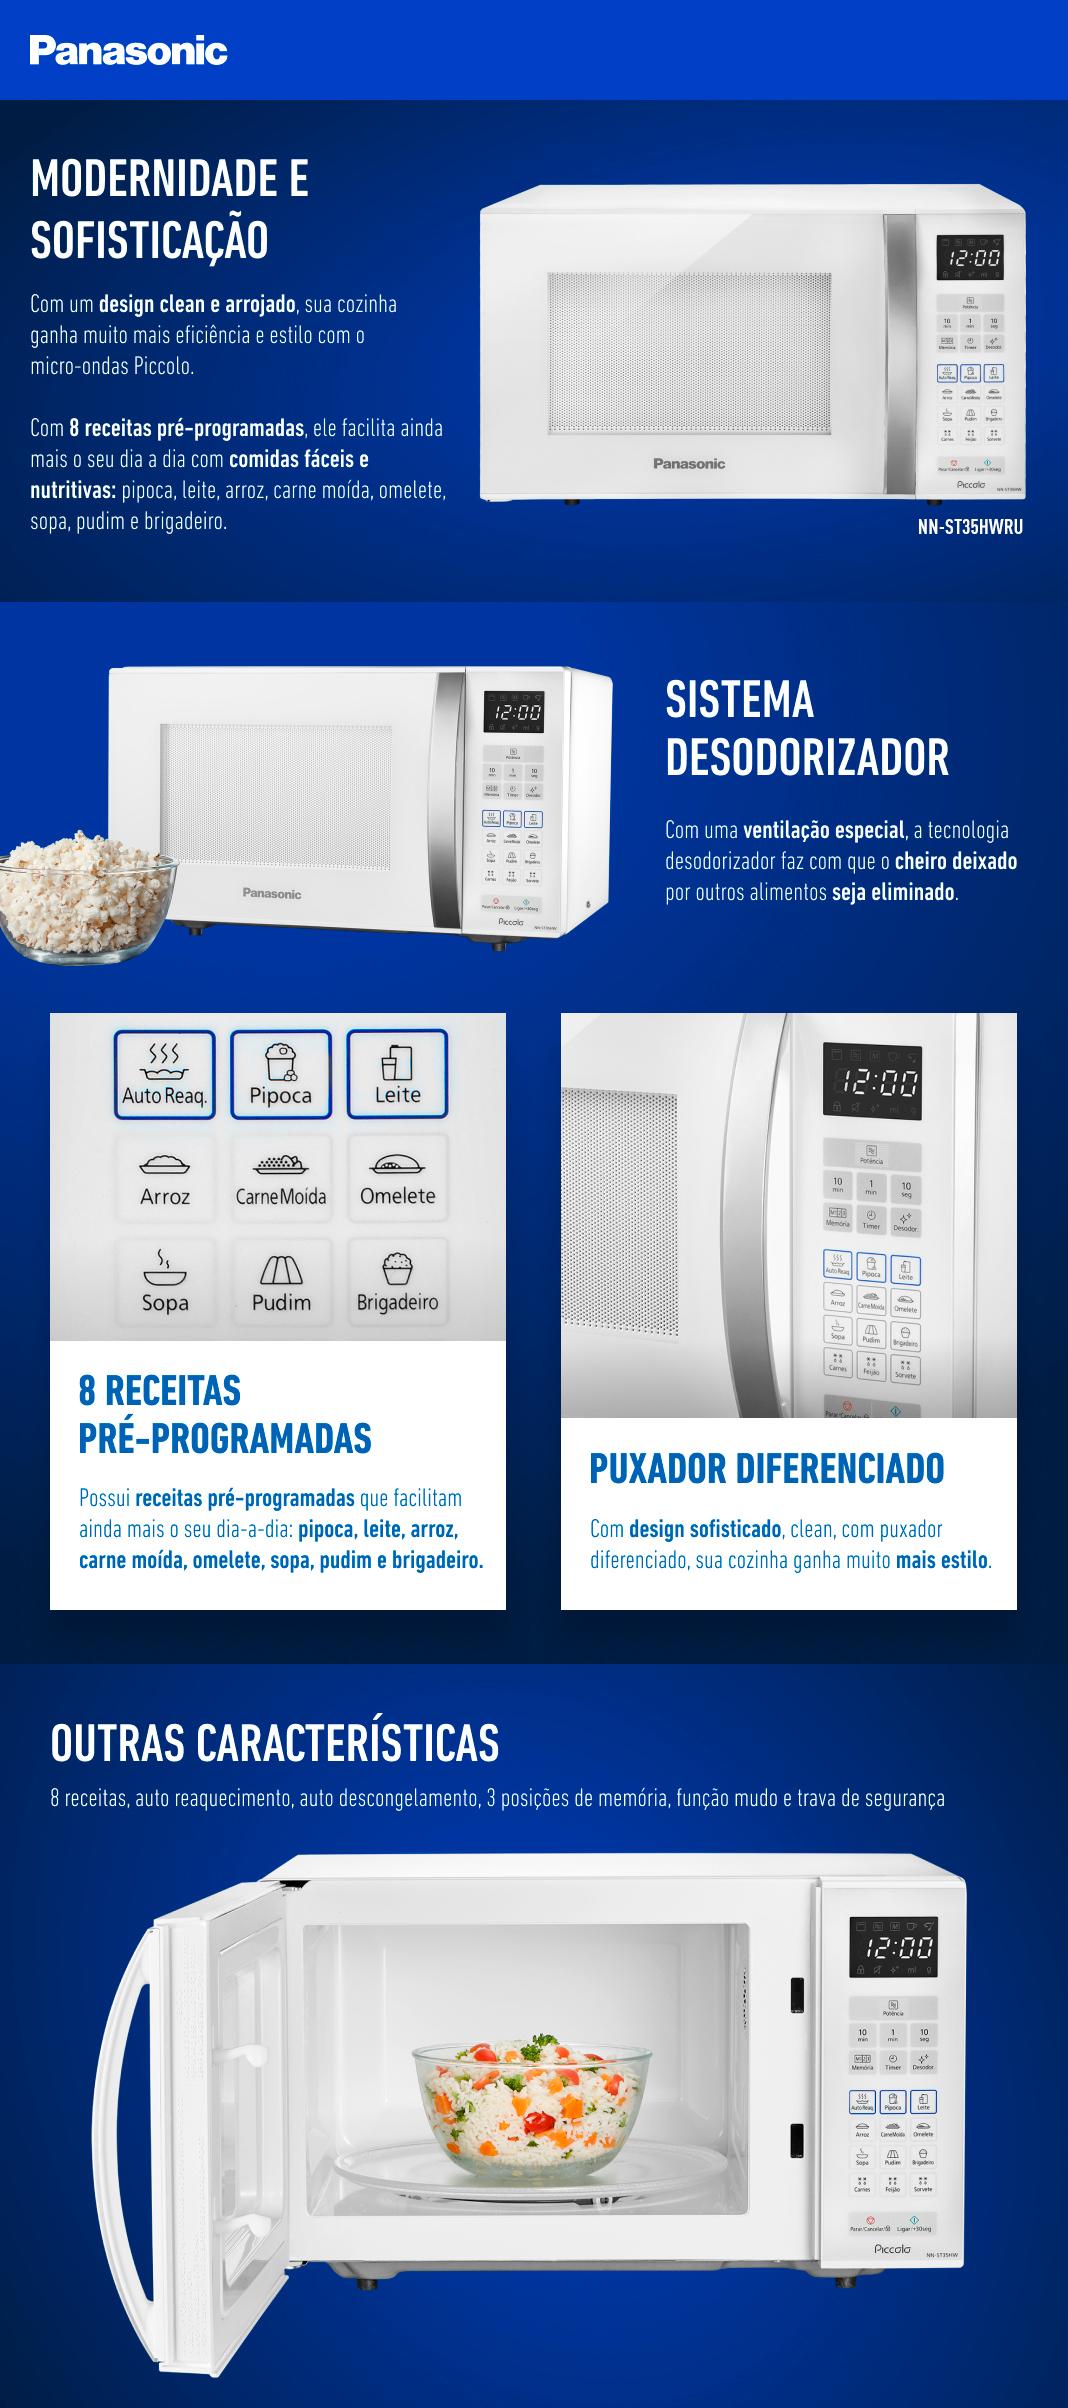 Micro-ondas Panasonic Piccolo 25L Branco 110V ST35HW